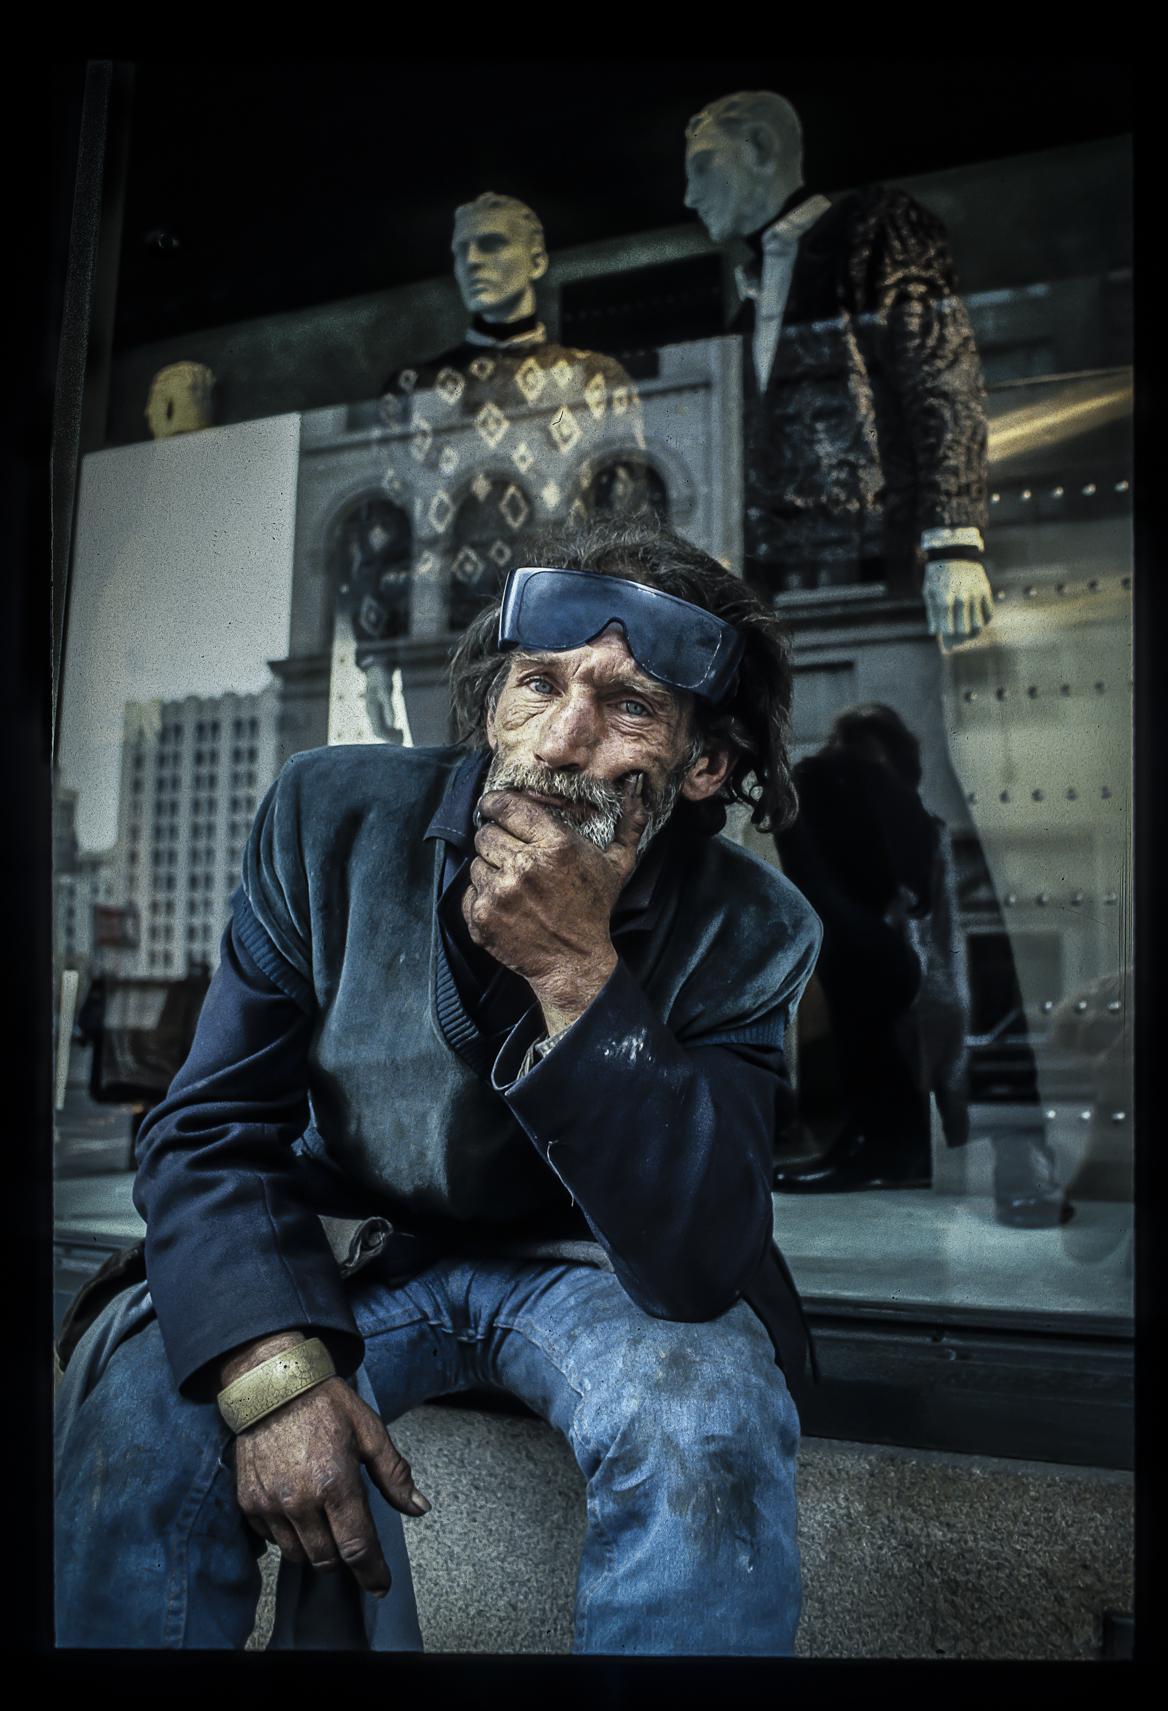 homeless guy store window-Edit.jpg